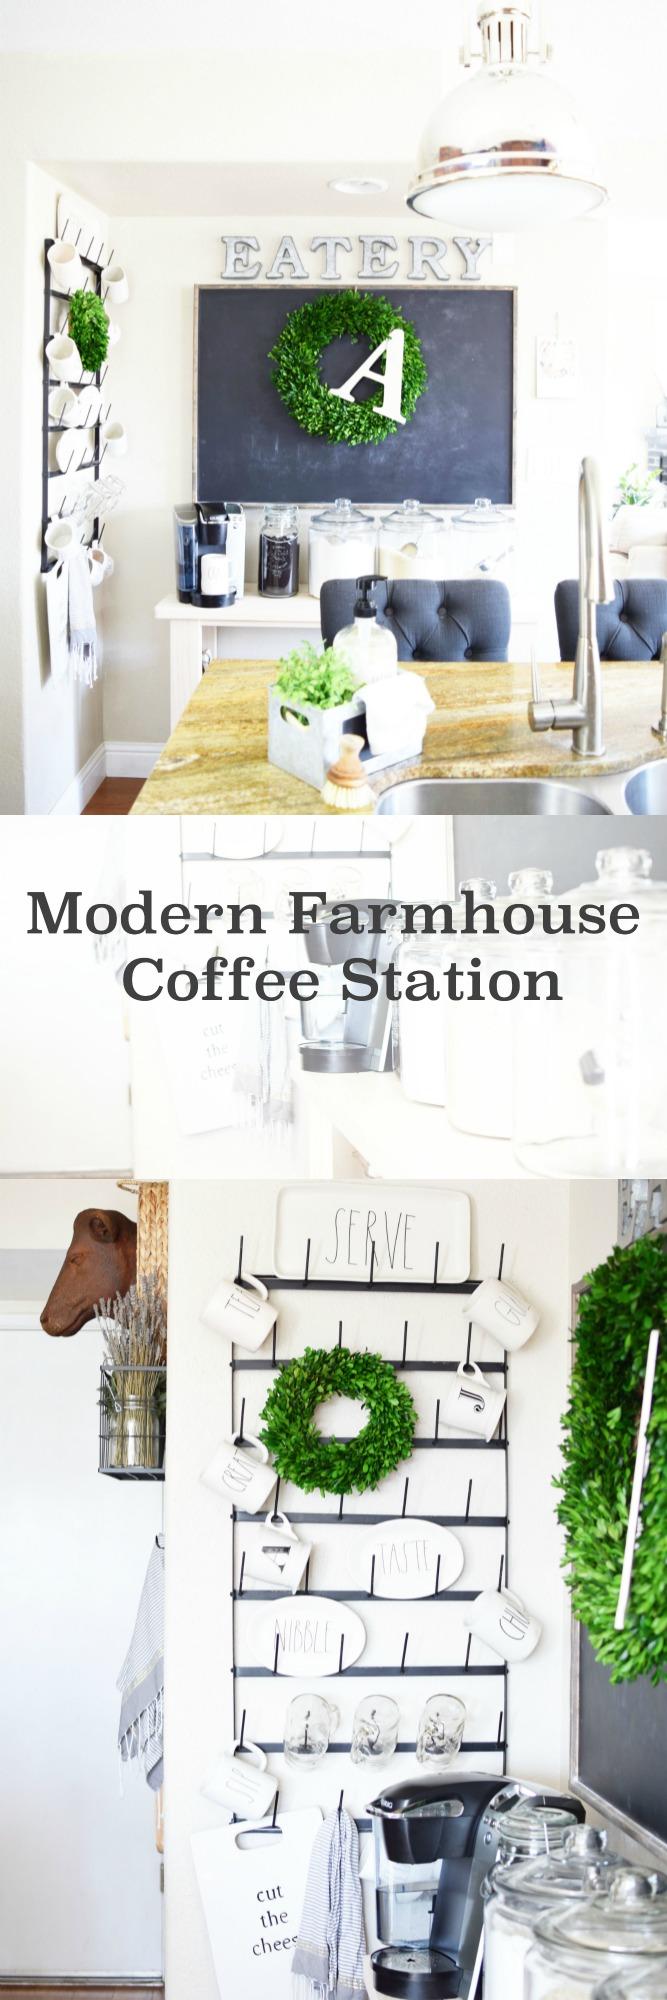 coffee station pin board